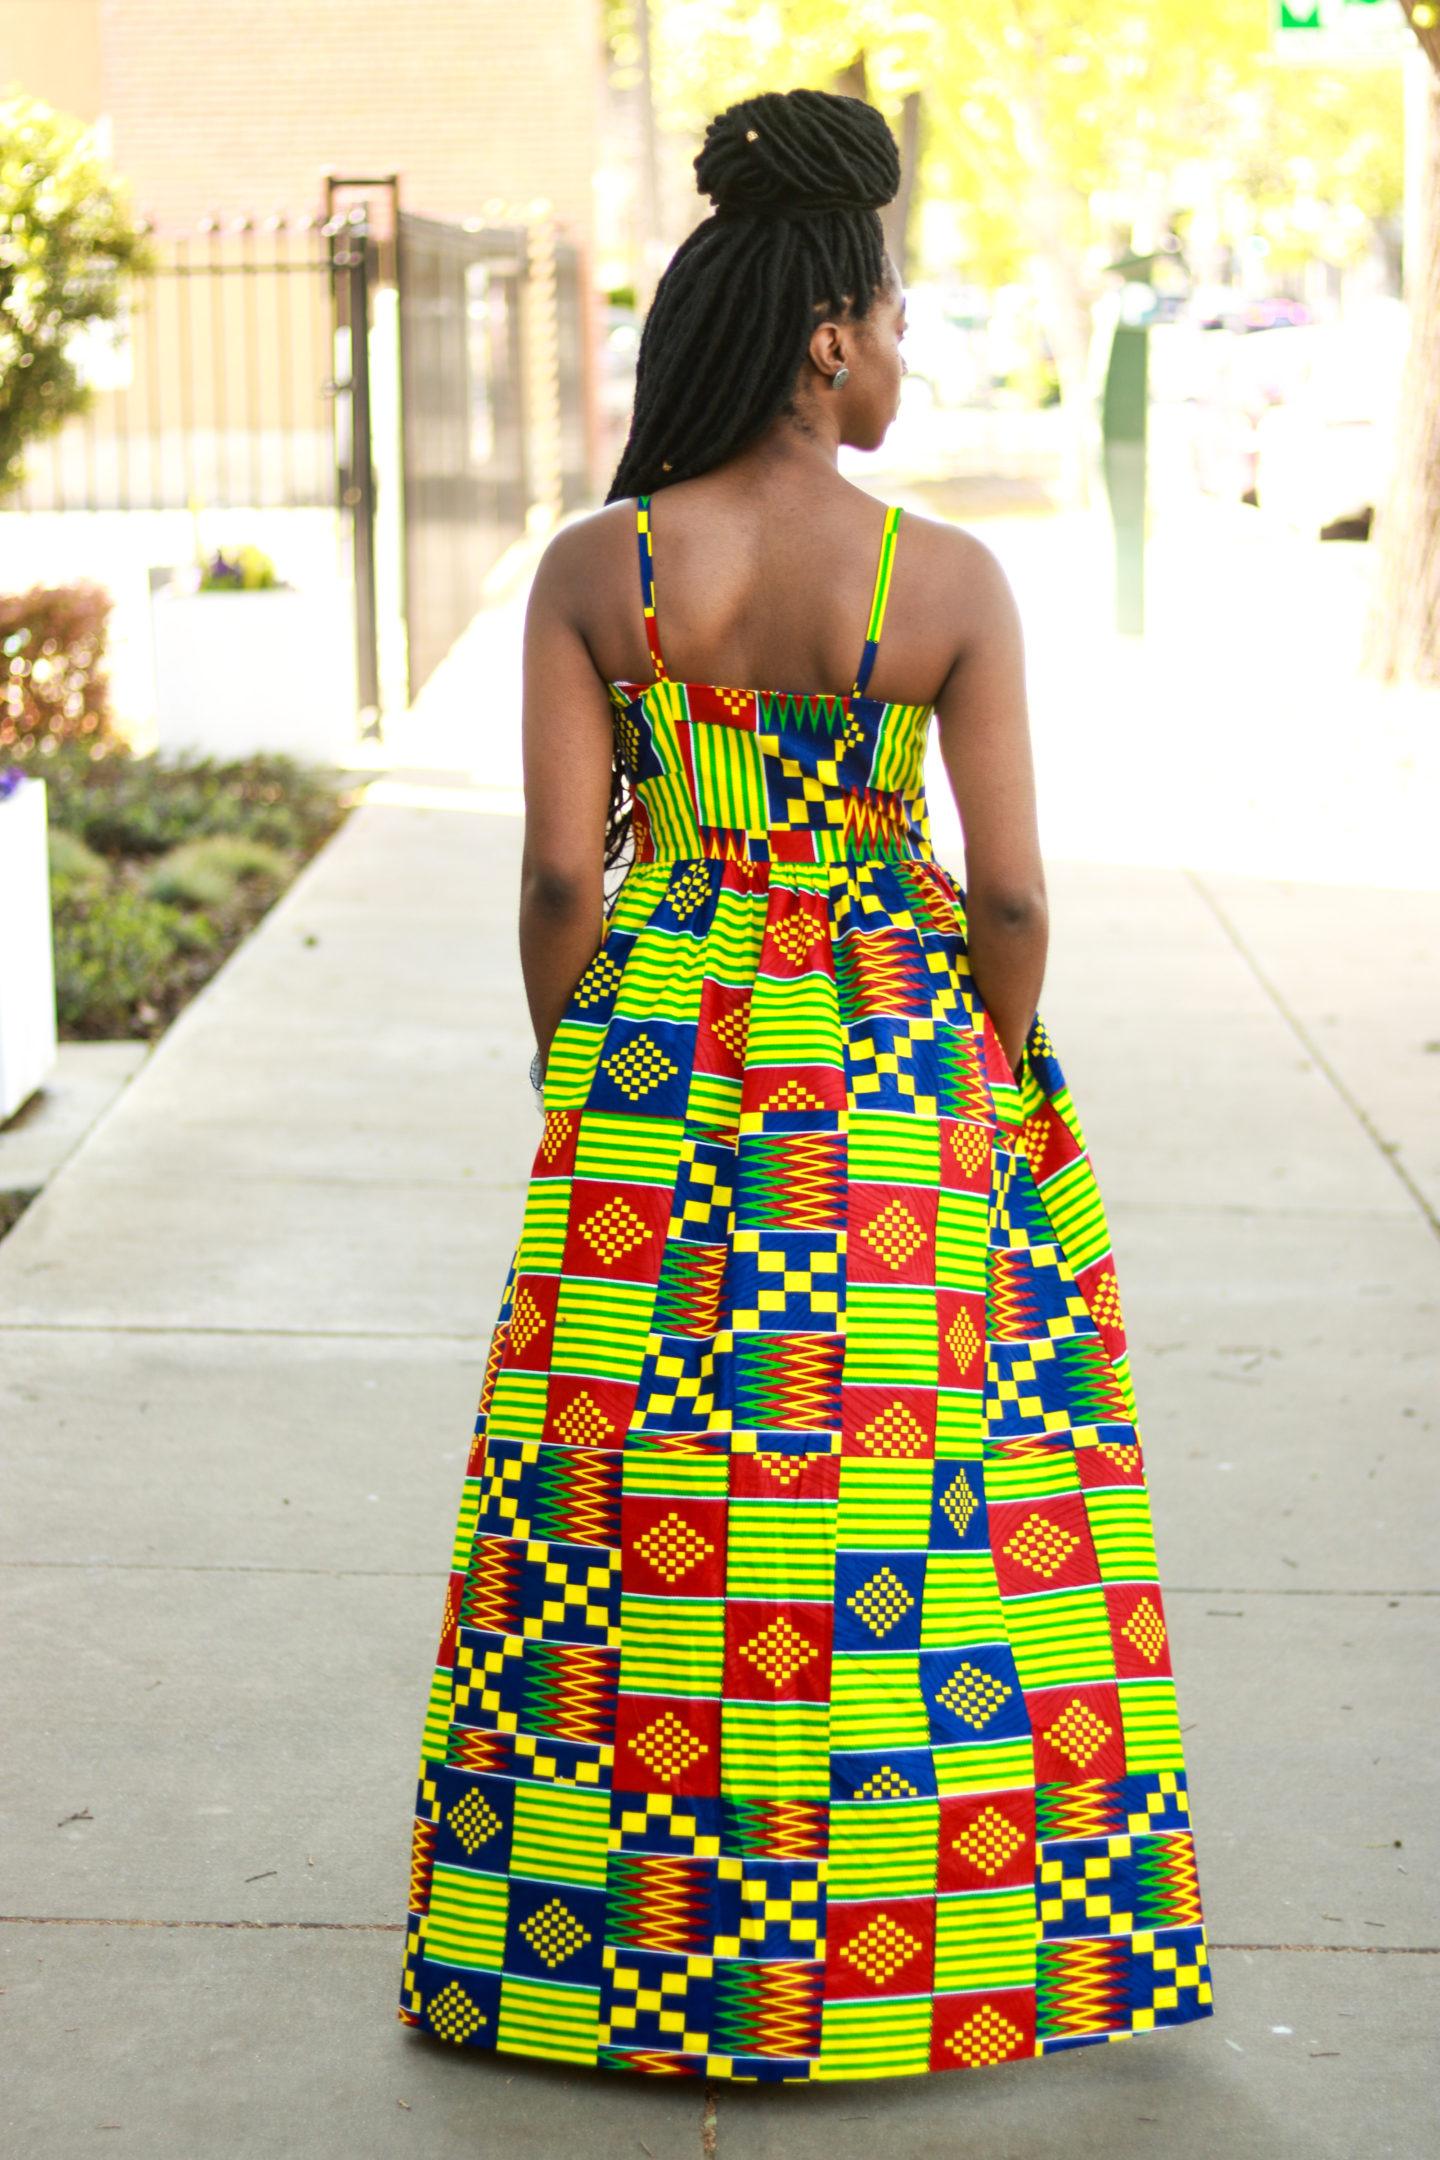 005ab7fa2f6 DIY Kente Print Ankara Maxi Dress with Pockets Buttons Jessica Dress  Pattern Review Kitenge Nigerian Fashion ...